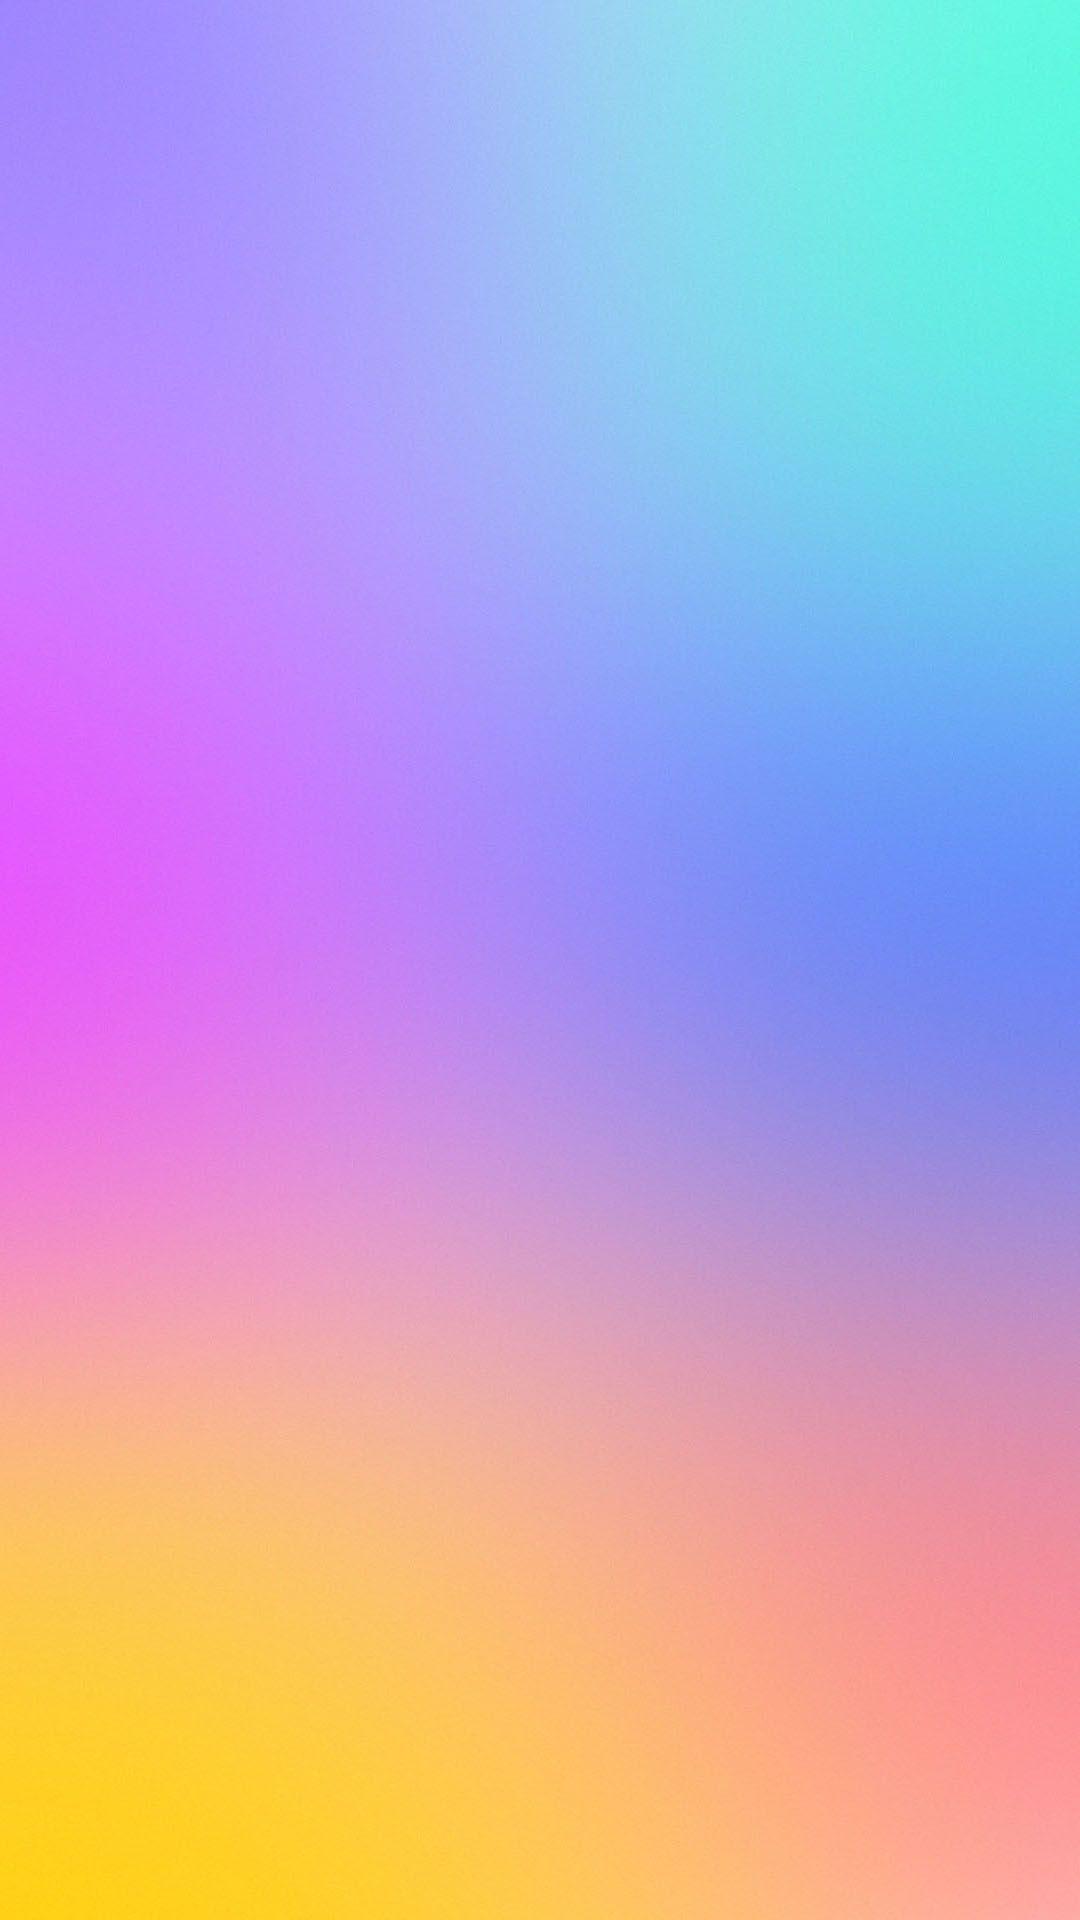 Rainbow iphone wallpaper tumblr - Rainbow Heart Wallpaper Iphone